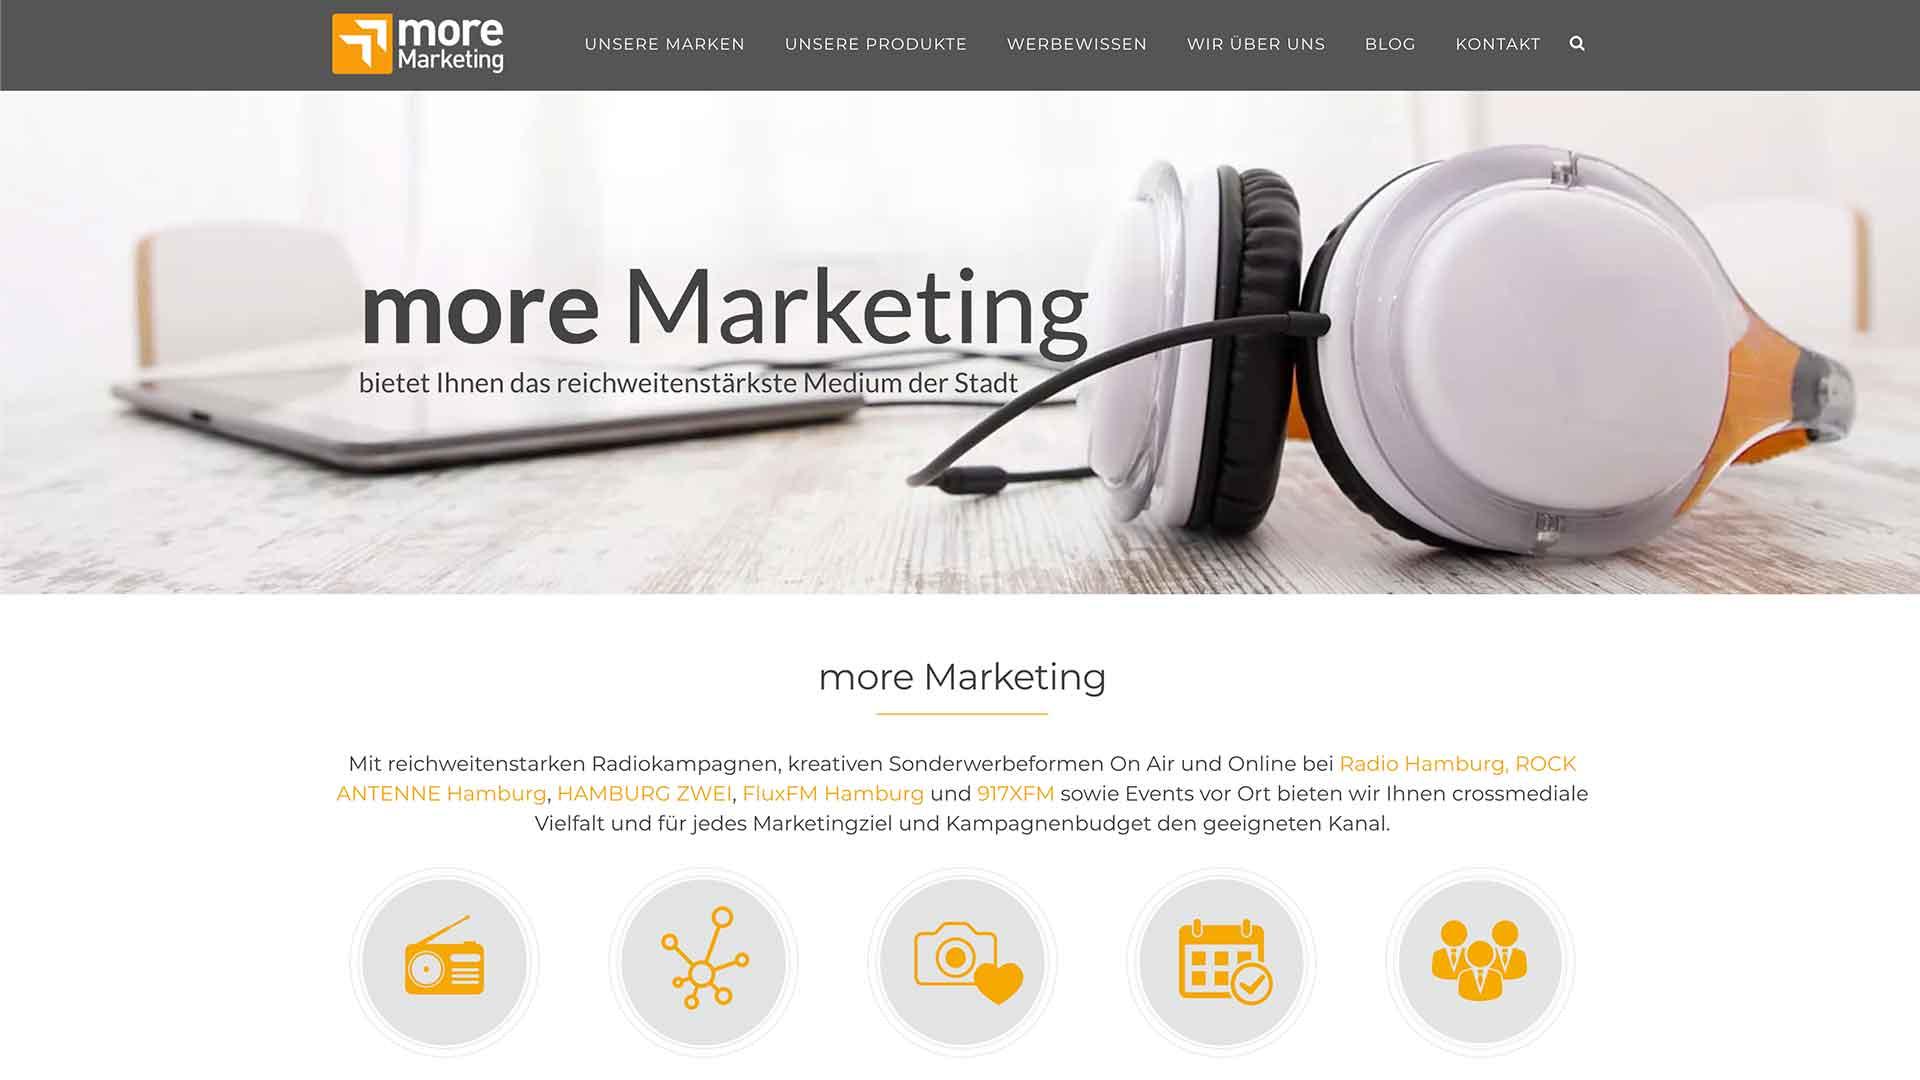 more marketing cliente referencia proyecto